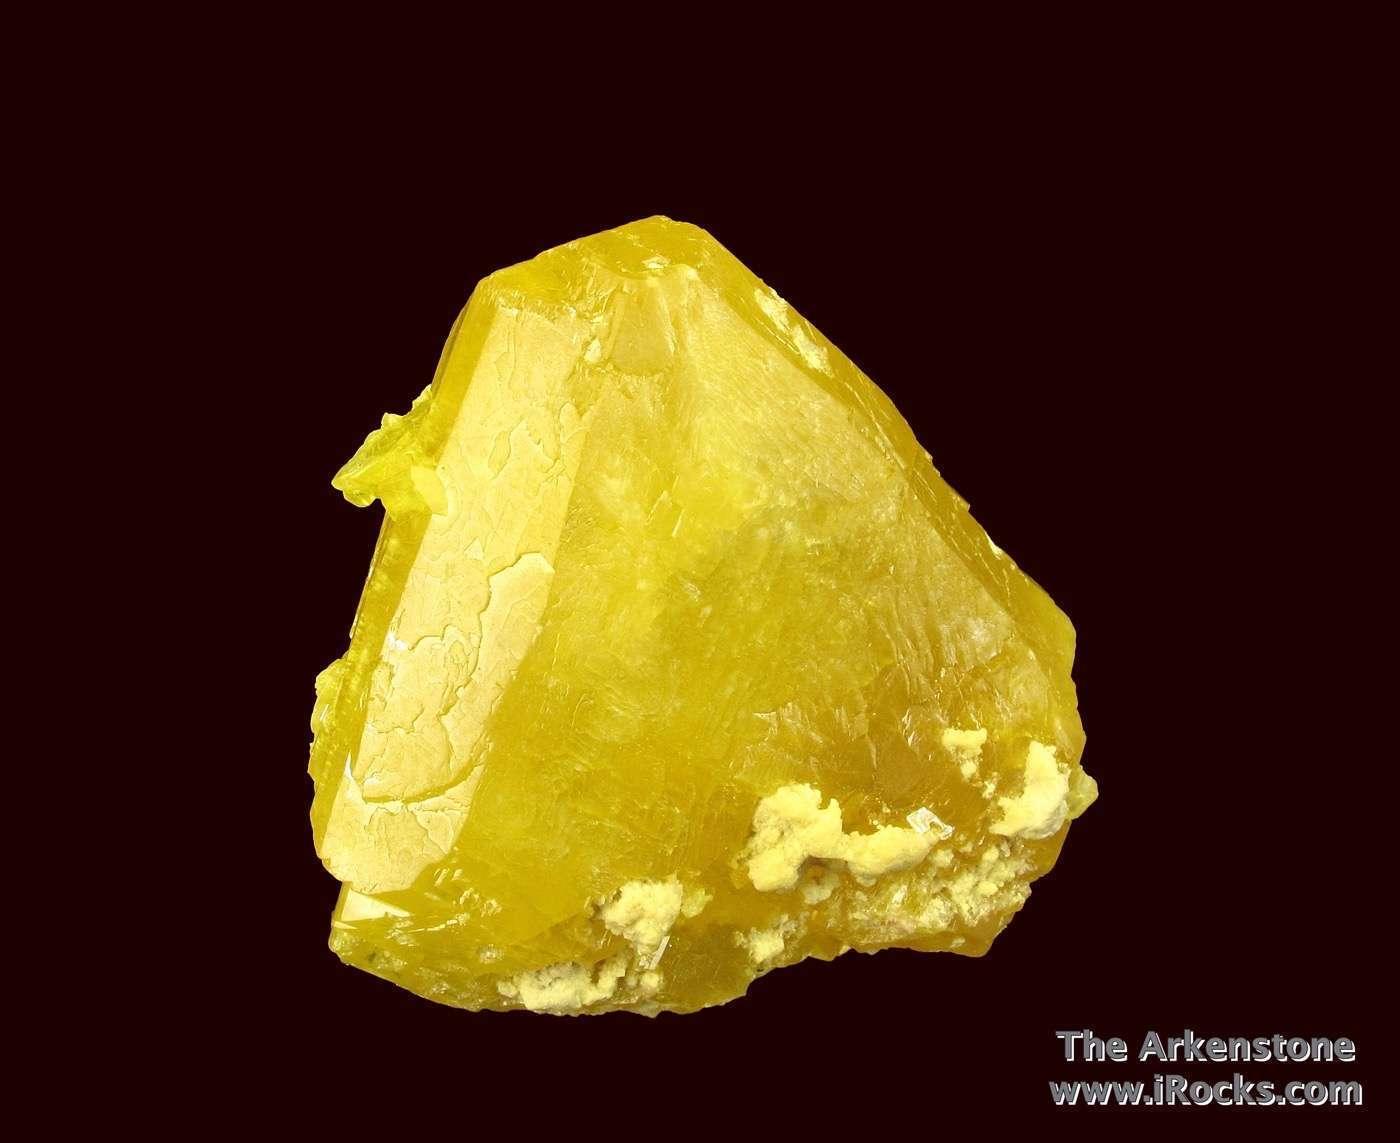 Sulfur - D16-36 - Cozzodisi Mine - Italy Mineral Specimen |Sulfur Mineral